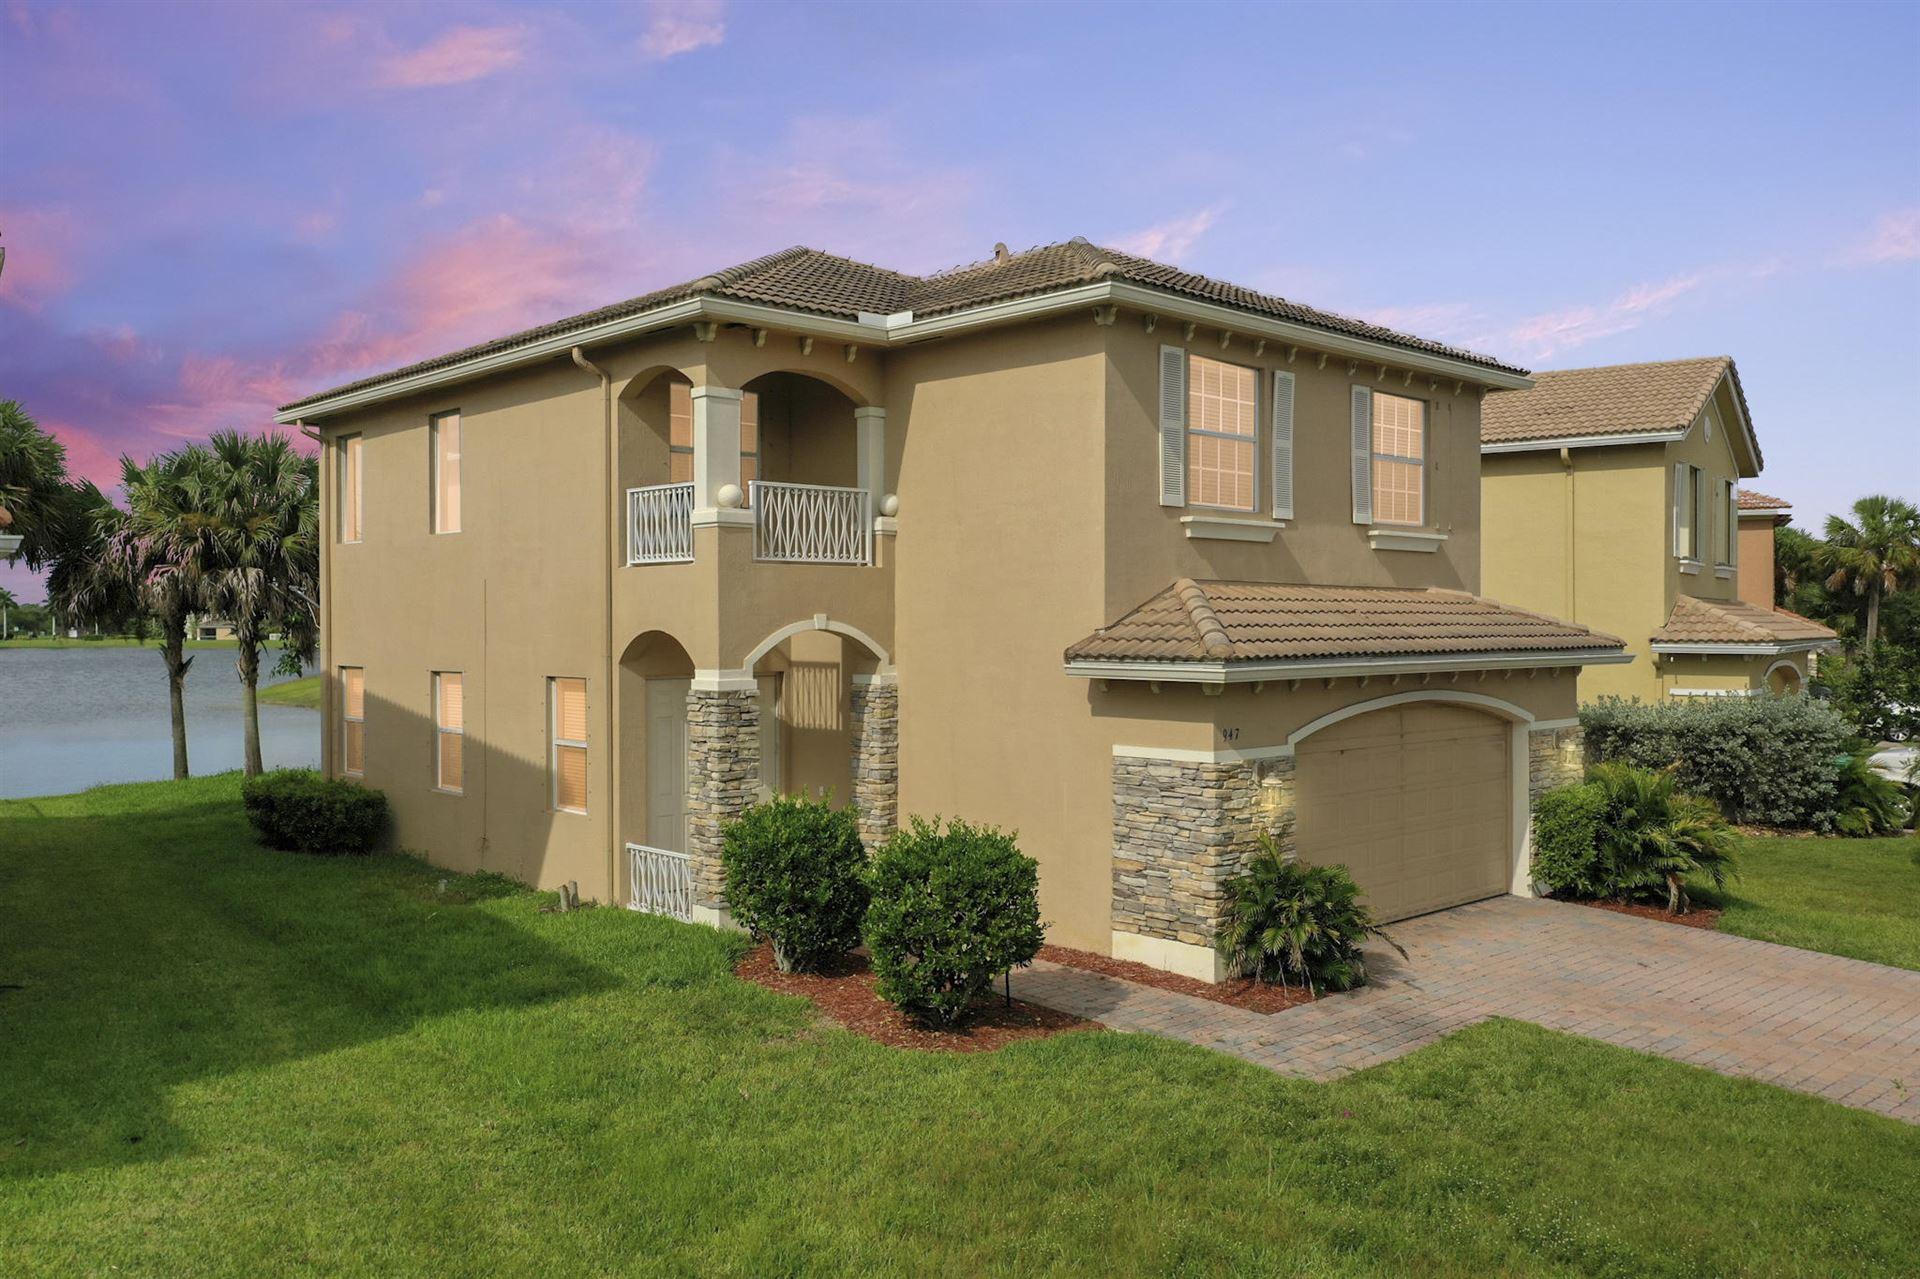 947 NW Leonardo Circle, Port Saint Lucie, FL 34986 - #: RX-10667105